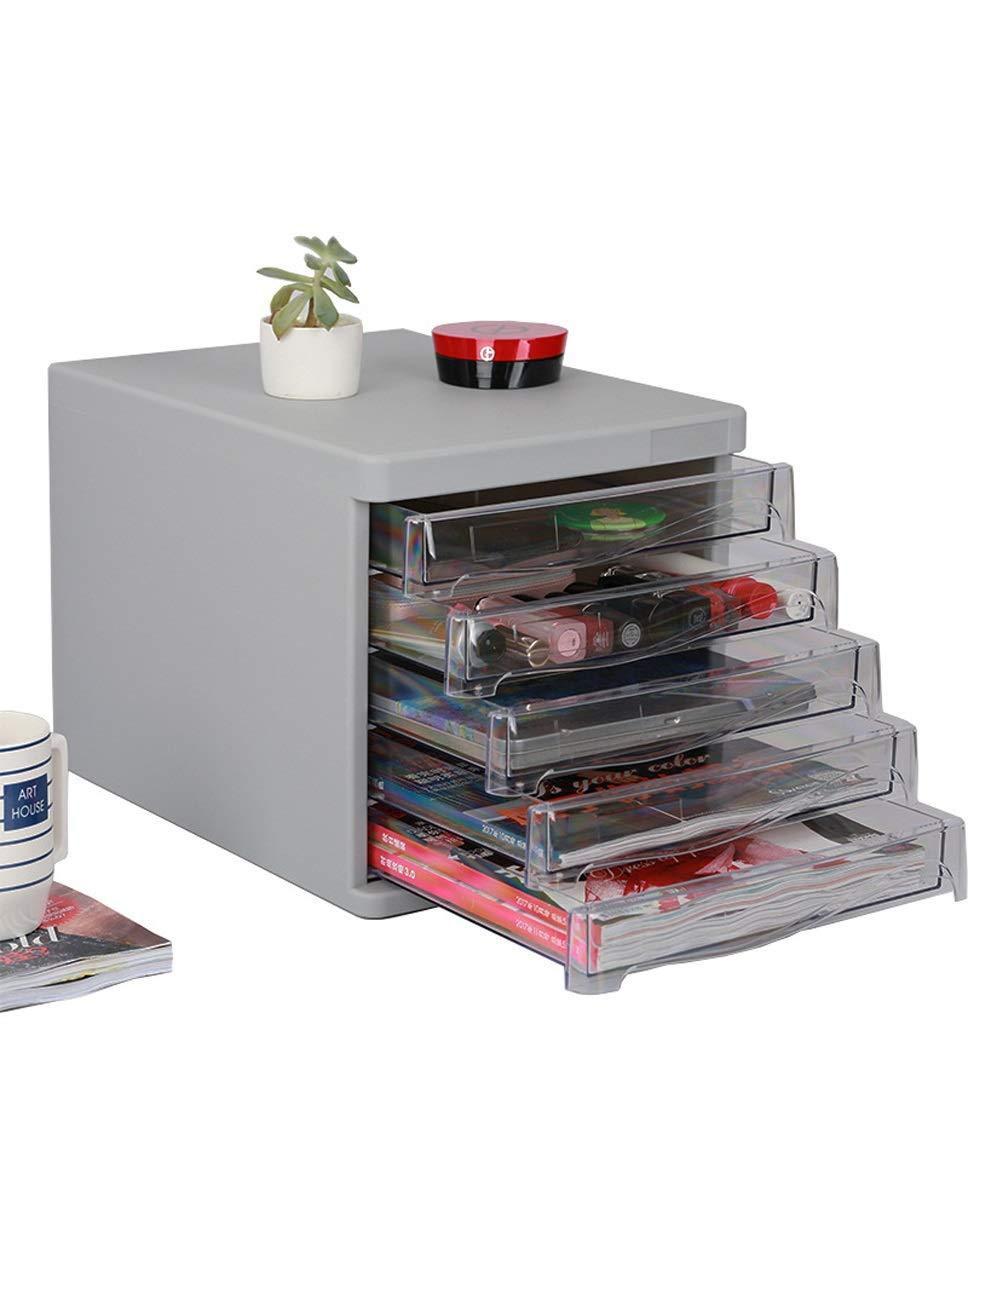 File Cabinet Drawer Mobile Multi-Function Cabinet 5 Drawers Color: Black, Gray Office Desktop File Storage Cabinet Storage Filing cabinets (Color : A)